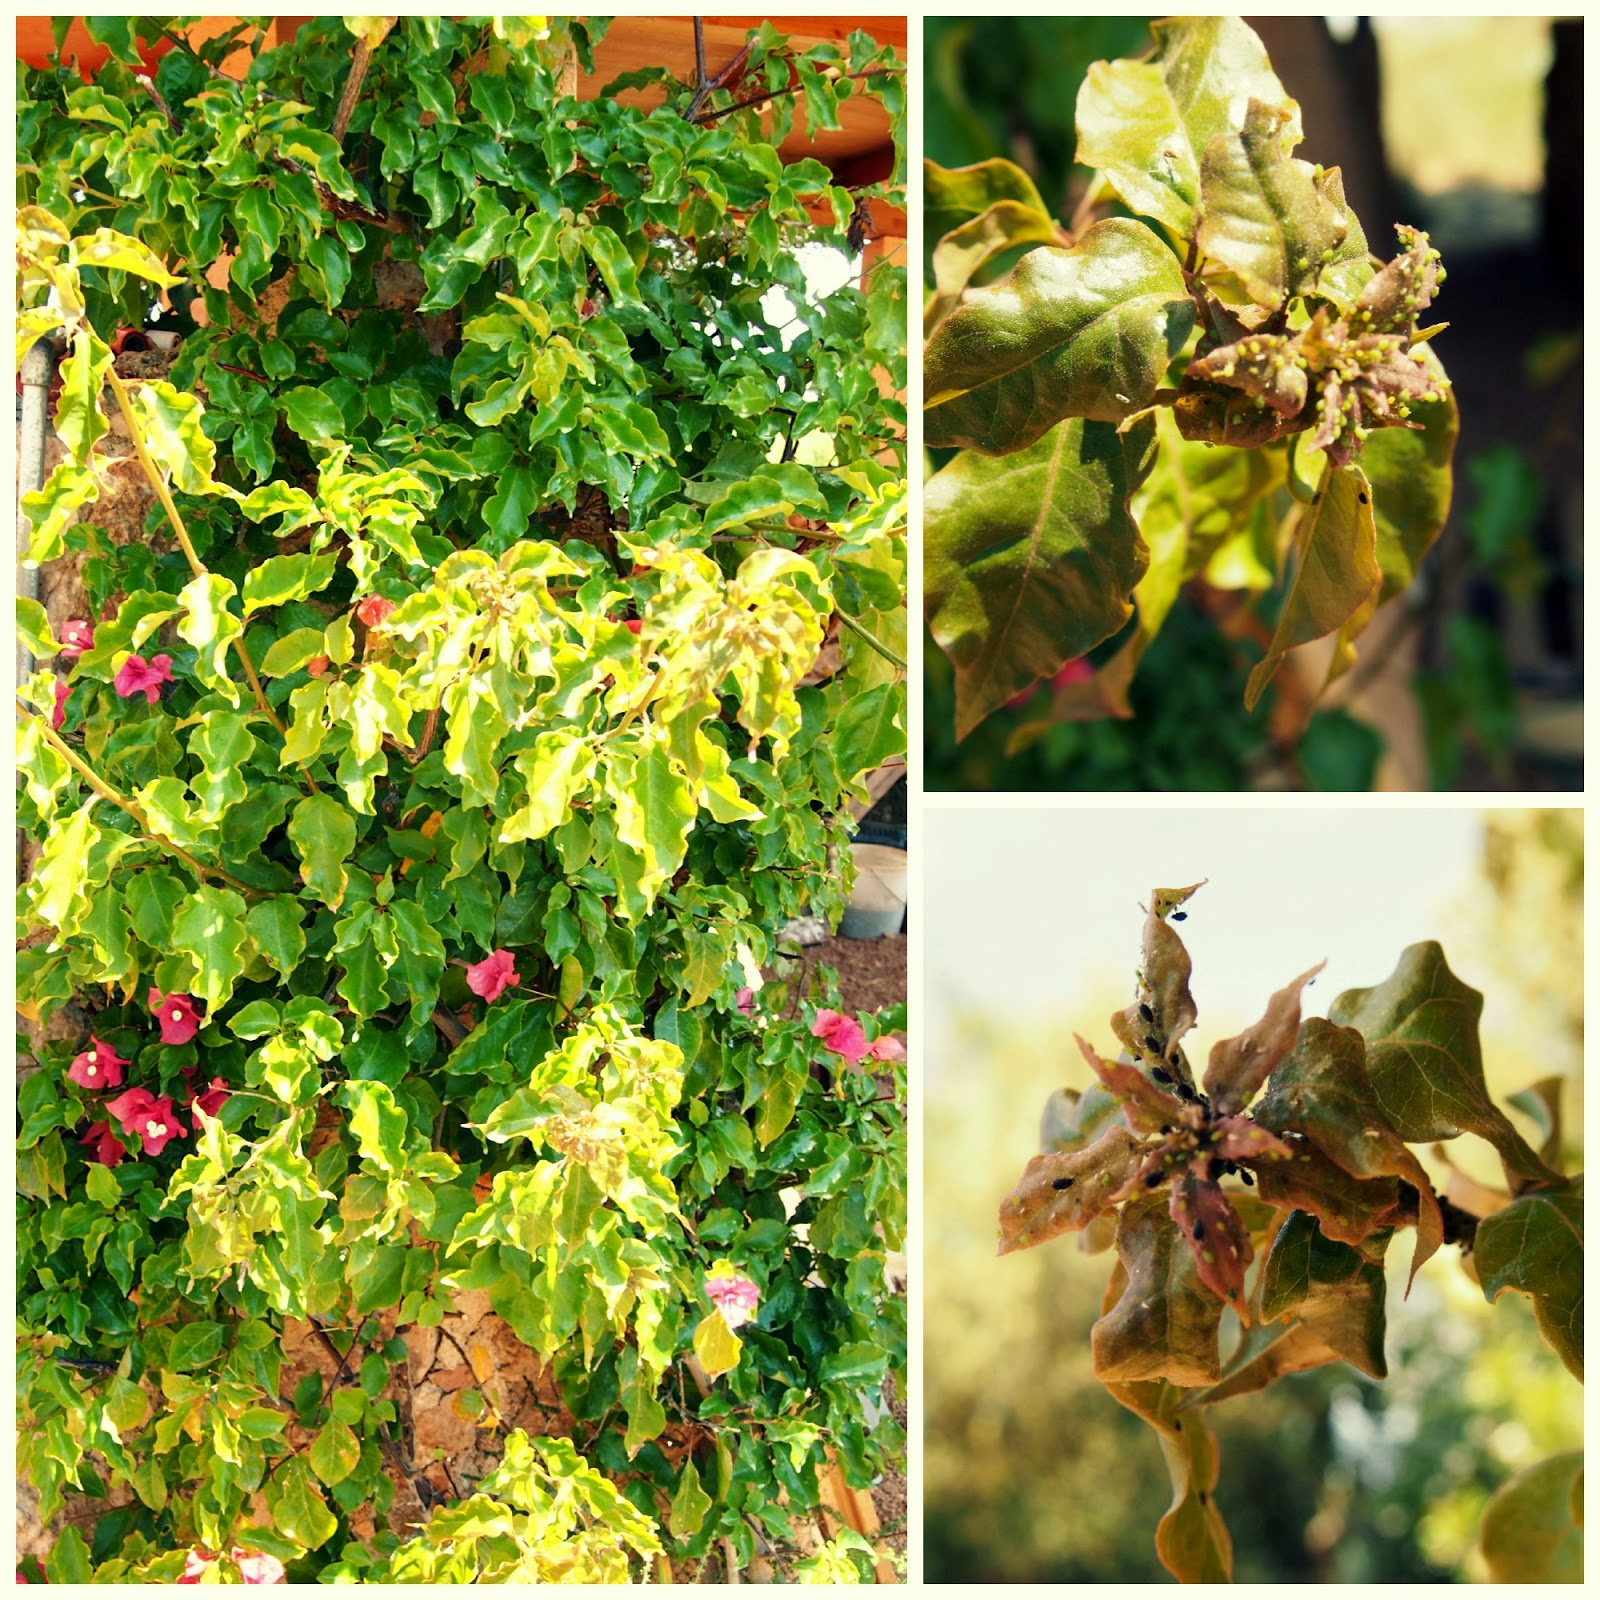 Mallorca handmade hoy empezamos nueva secci n jardiner a for Viveros frutales wikipedia